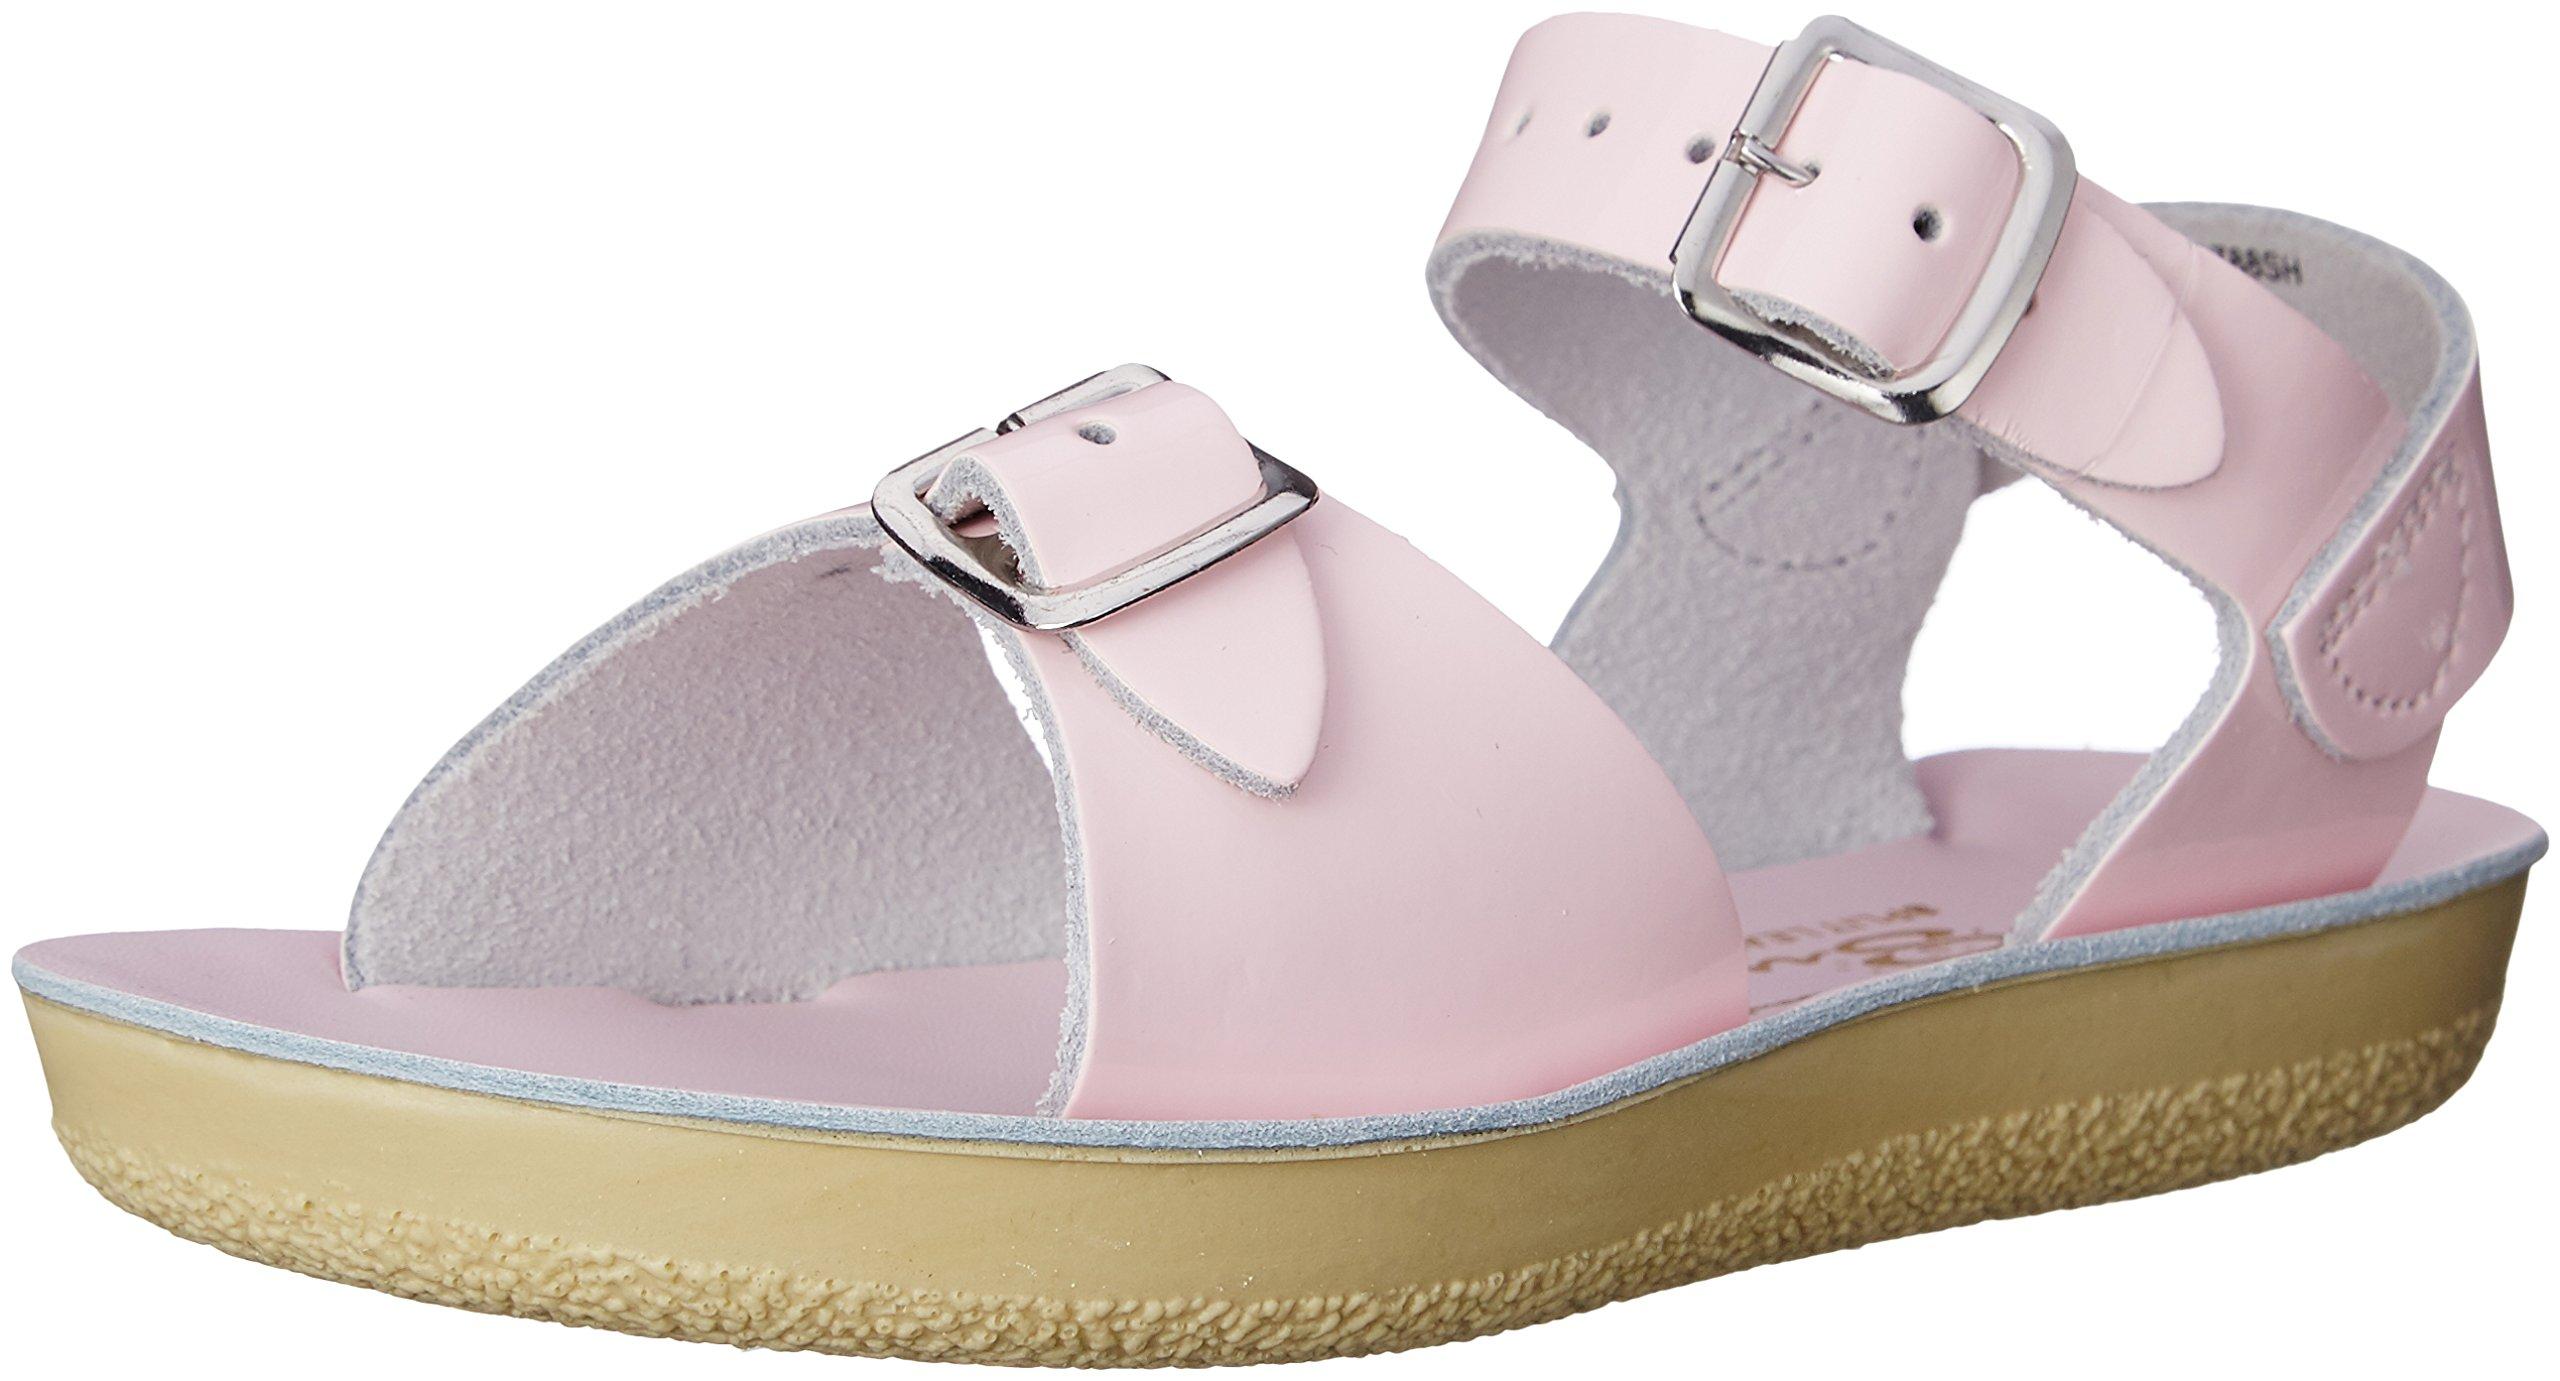 Salt Water Sandals by Hoy Shoe Kids' Sun-San Surfer Flat, Shiny Pink, 4 M US Toddler